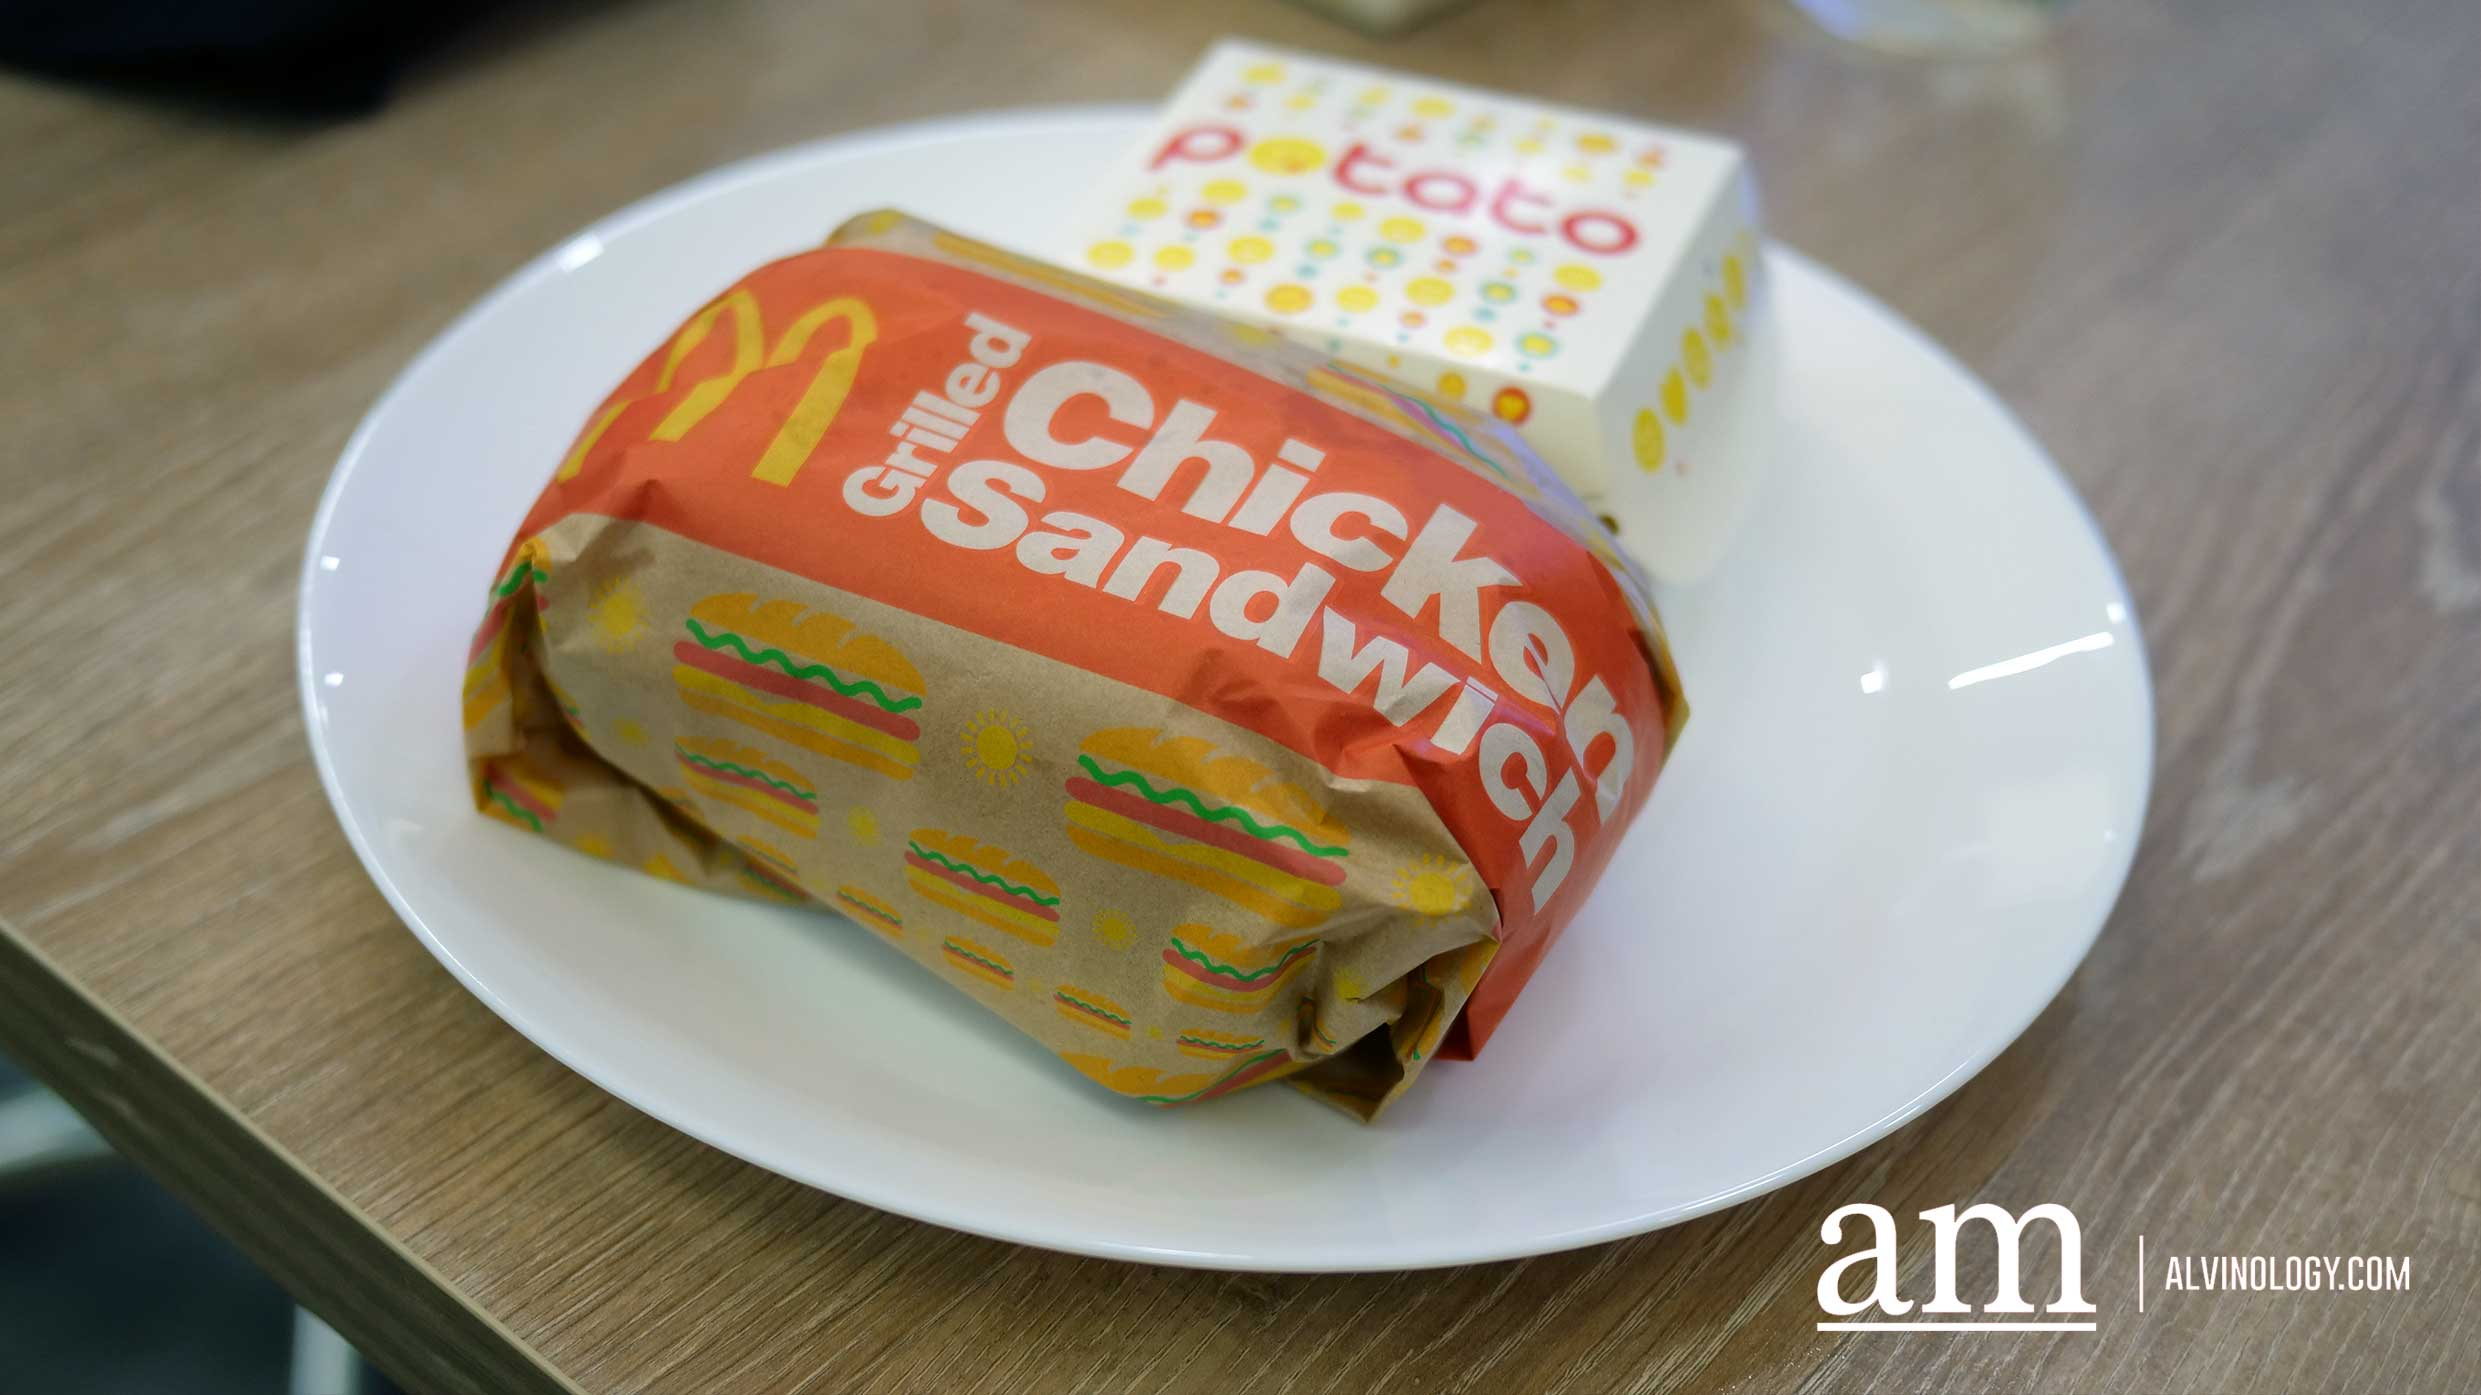 McDonald's Singapore introduces Emoji Potato, Grilled Chicken Sandwich, Crispy Fish Sandwich and brings back Scrambled Egg Burger - Alvinology